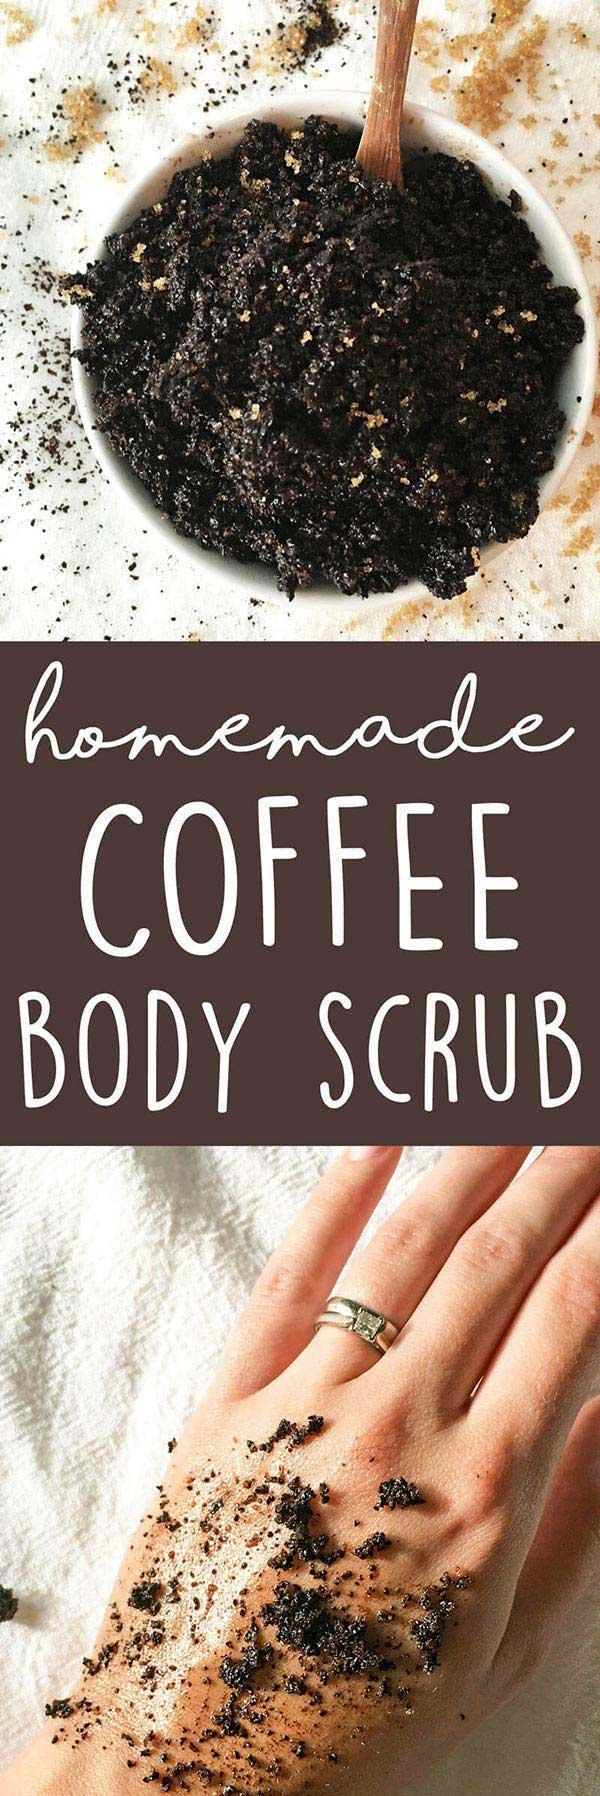 DIY Coffee Body Scrub - this 3-ingredient homemade body scrub recipe is great for dry skin & exfoliating. LOVE it! | www.www.karissasvegankitchen.com - Coffee Scrub